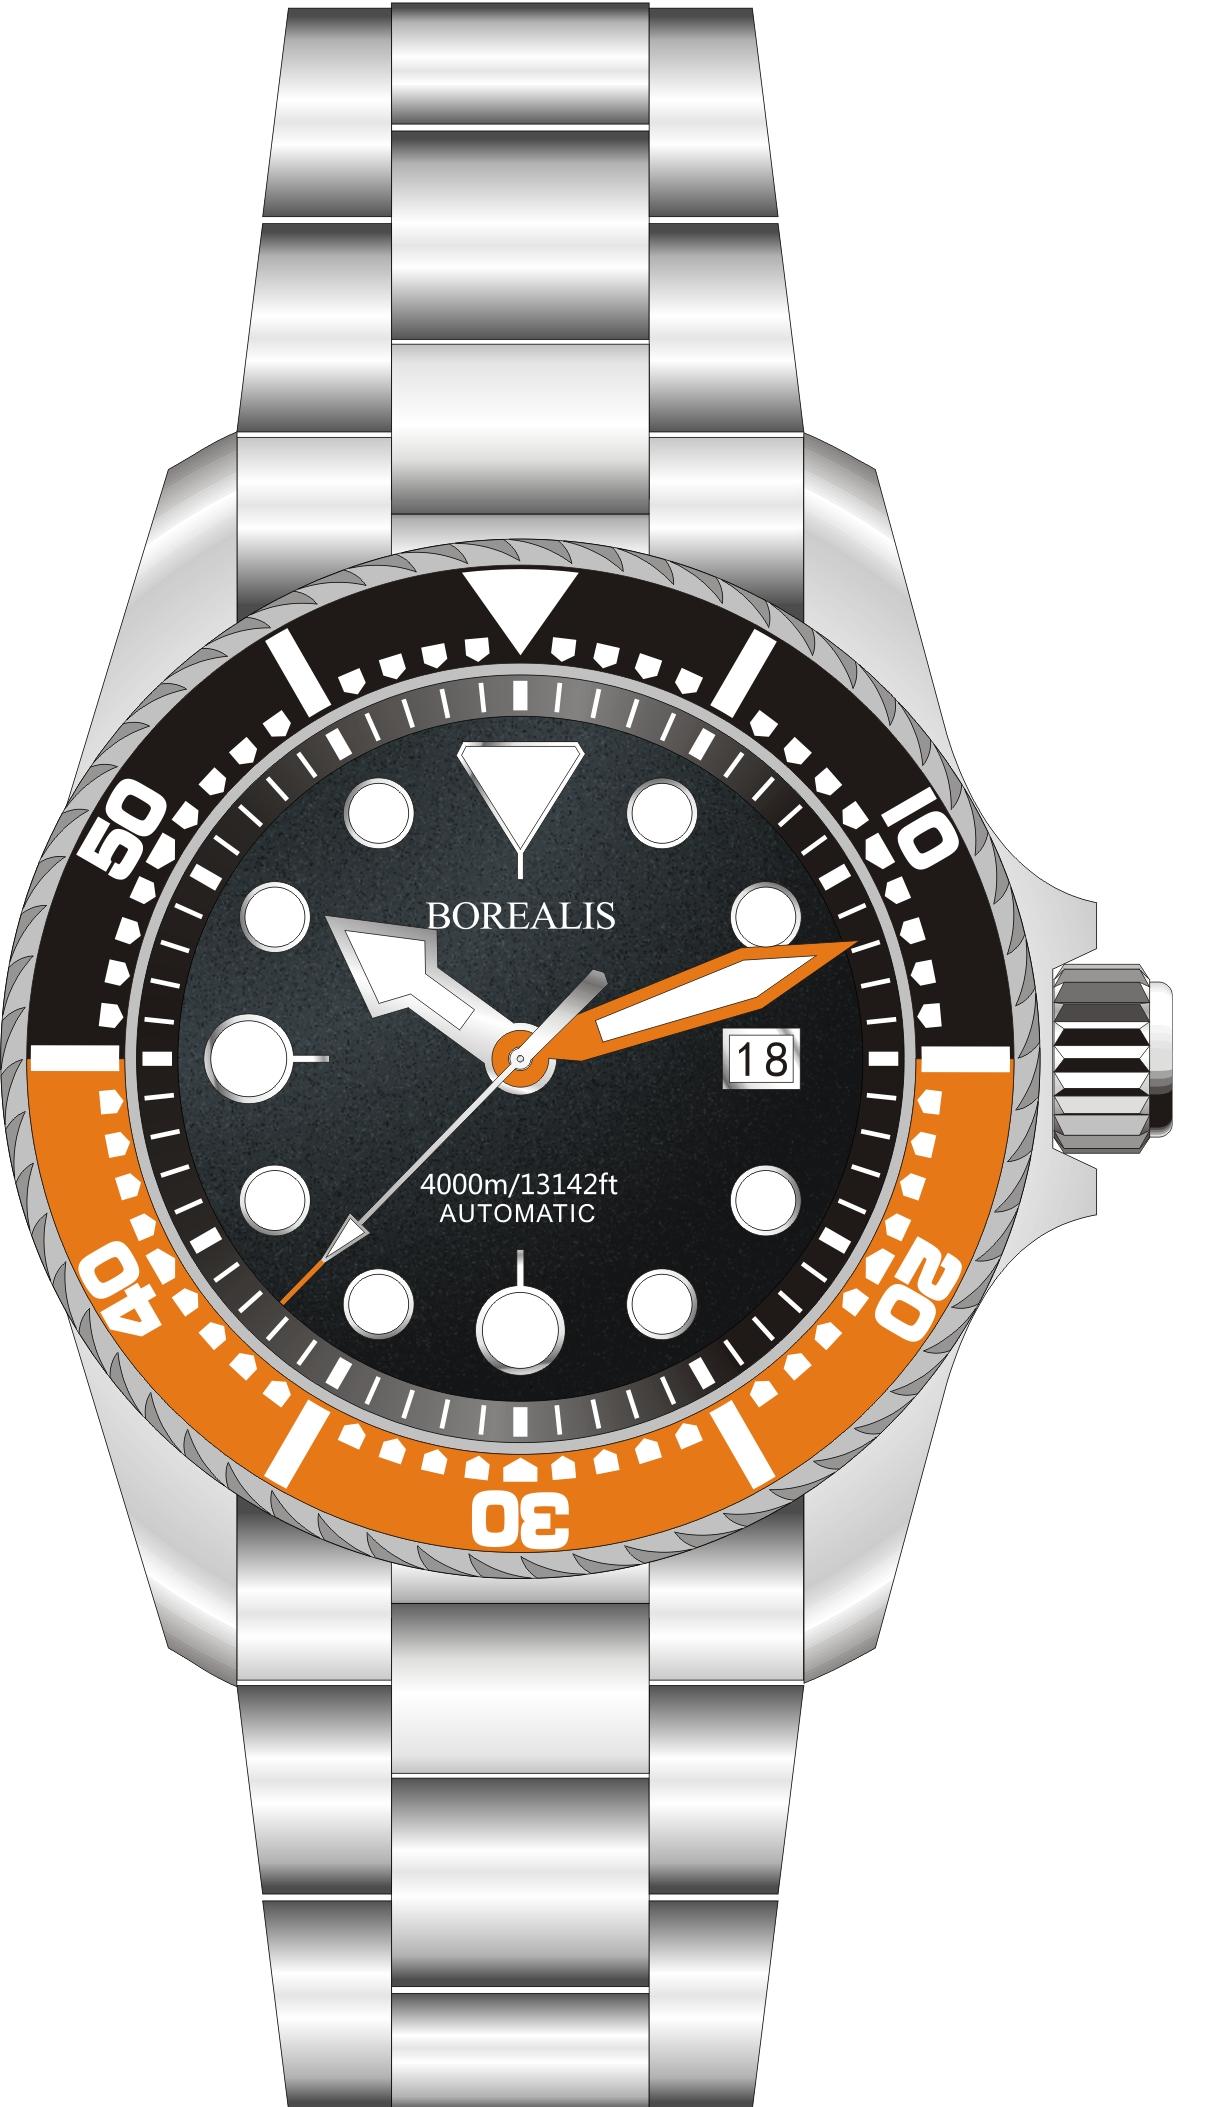 Borealis Seafarer II Stainless Steel Black Orange BGW9 Sapphire Turbine Style Grip Bezel 4000m Miyota 9015 Automatic Diver Watch BSFIIBLACKORANGEBGW9